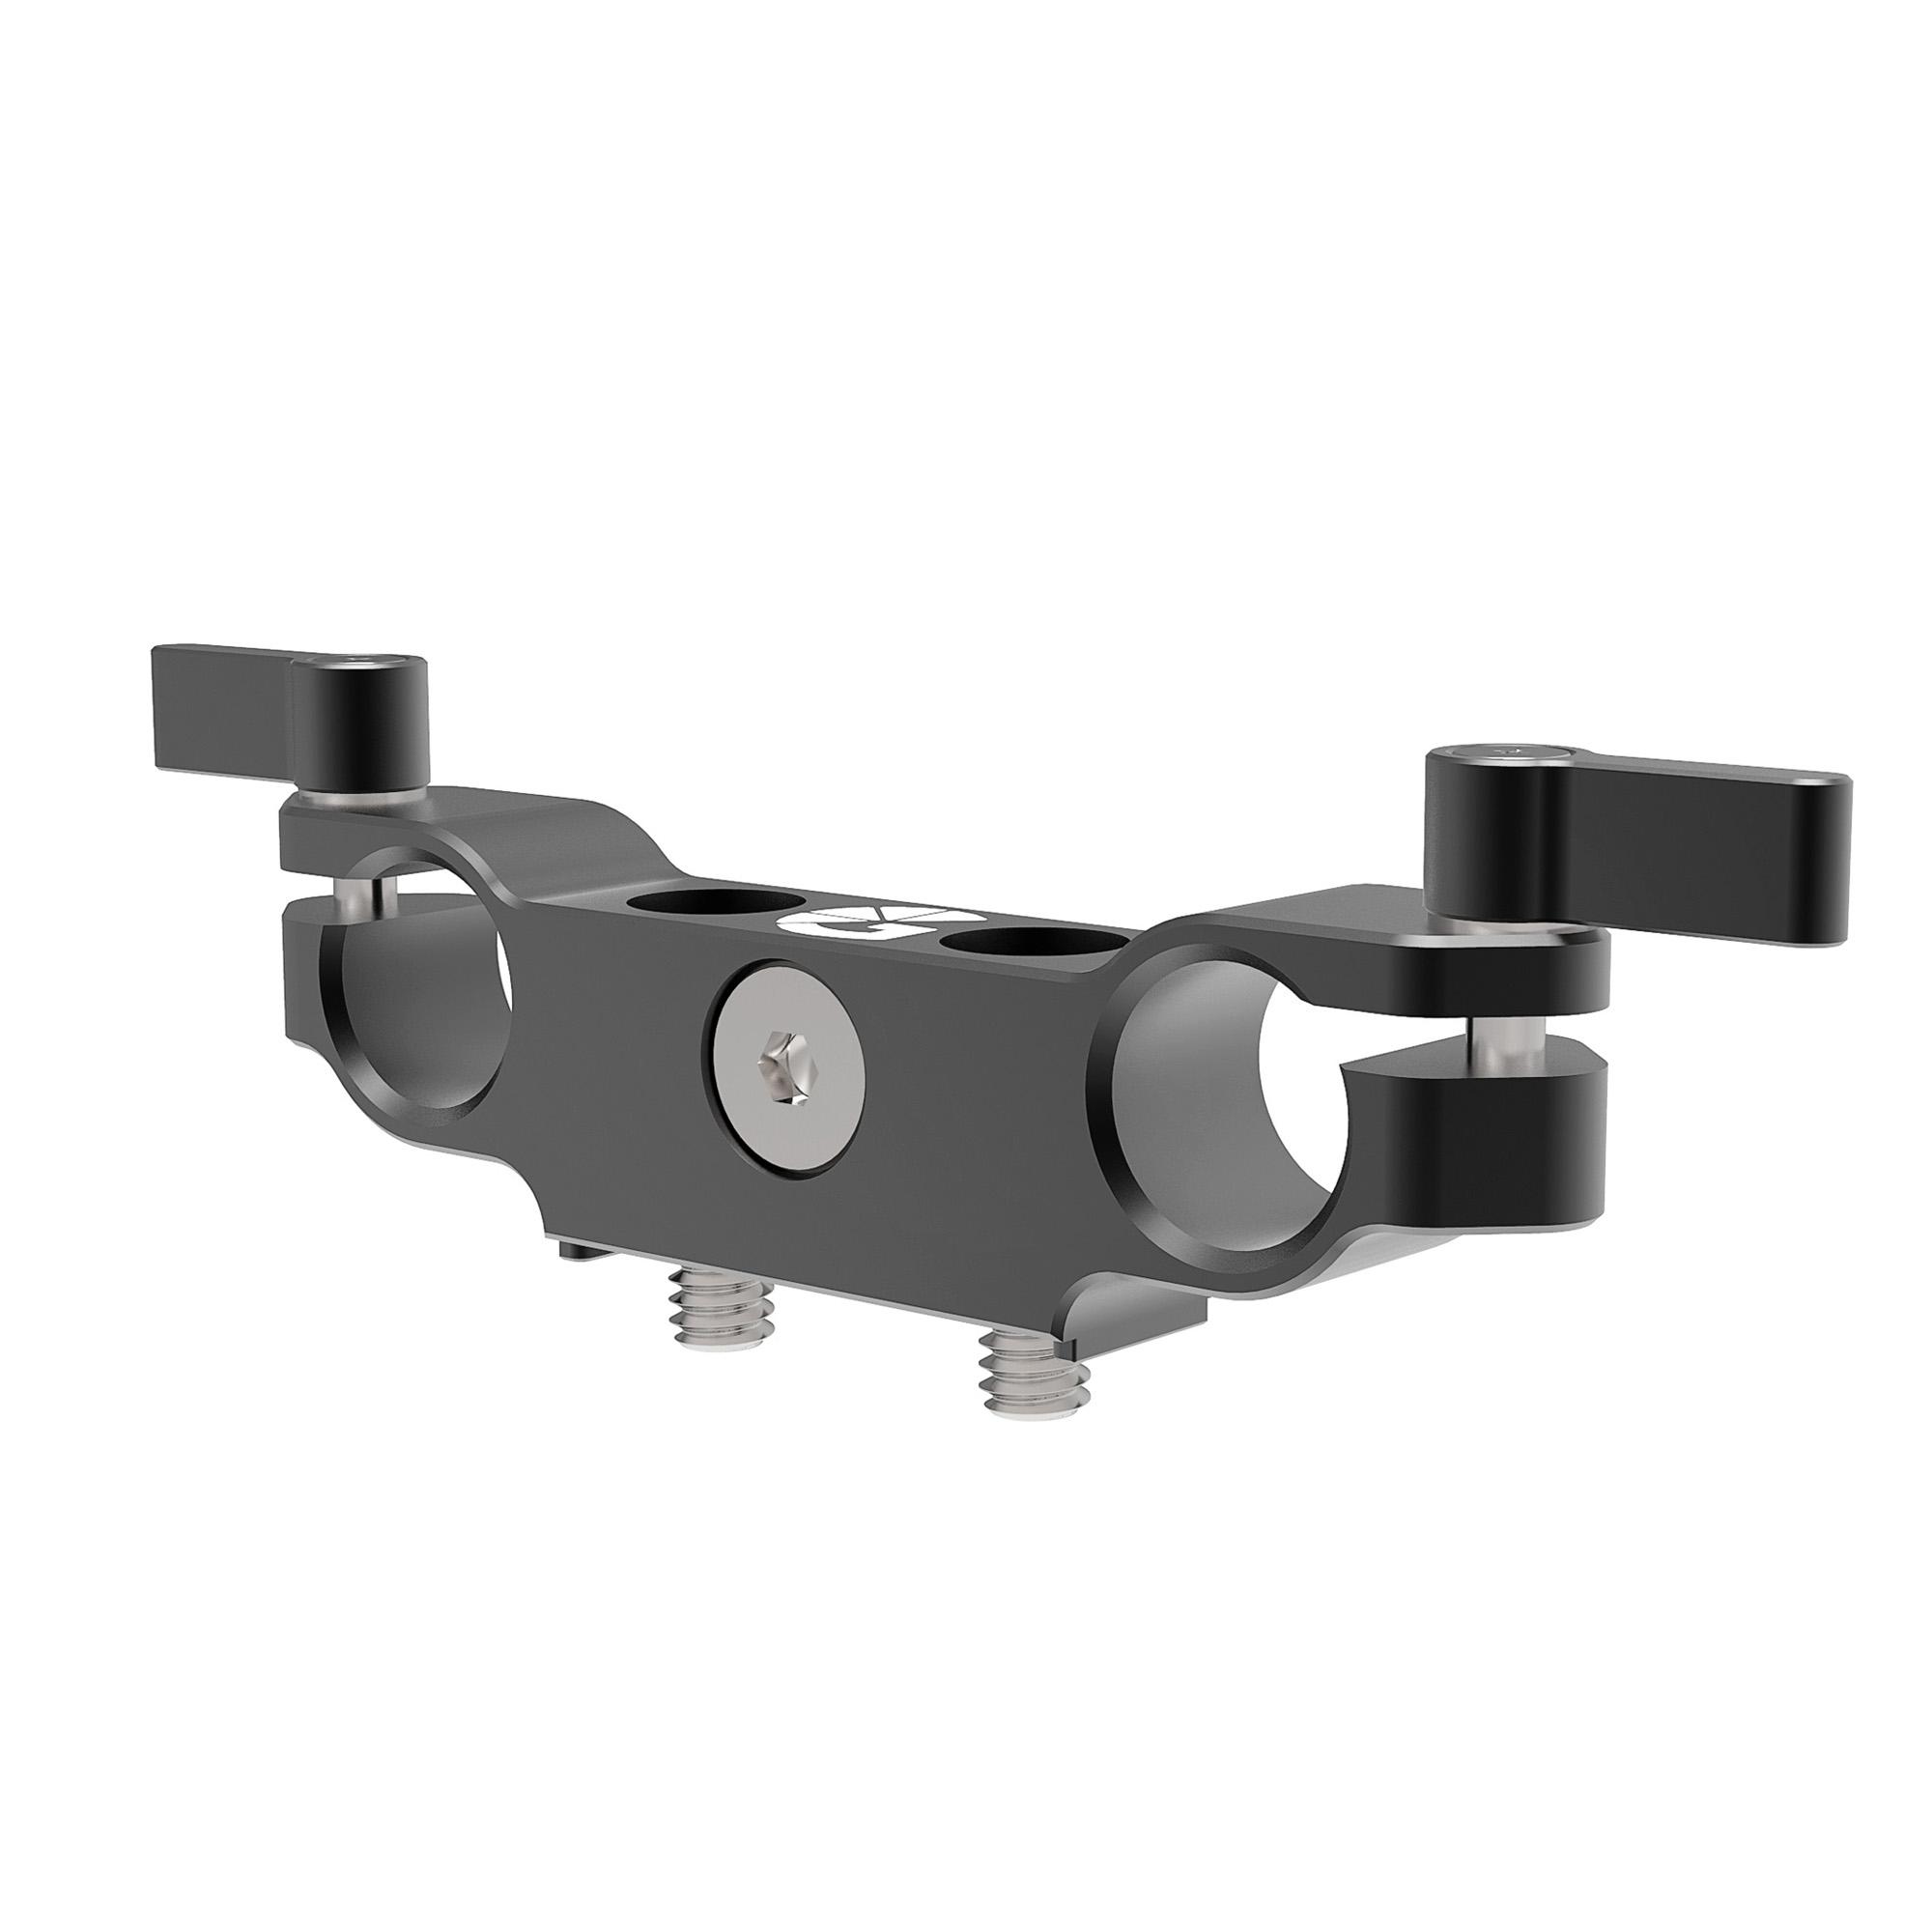 B4003.1010 Left Field Universal 15mm LWS Bracket 1